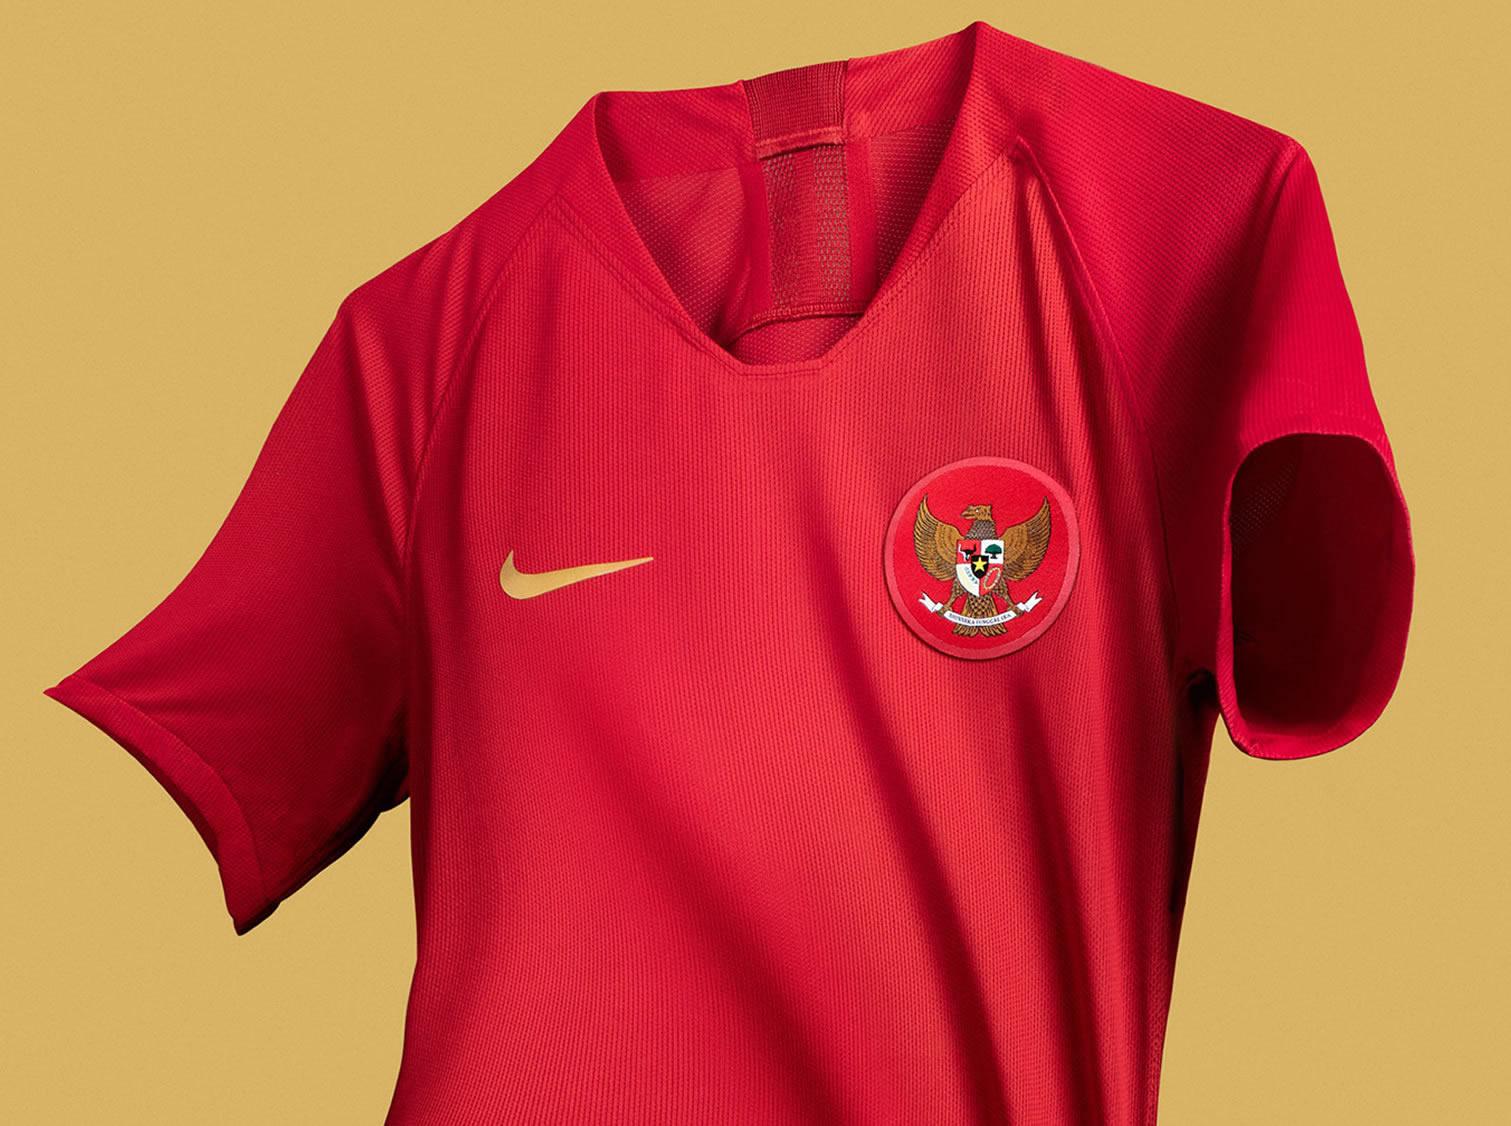 Camiseta titular de Indonesia 2018/19 | Imagen Nike